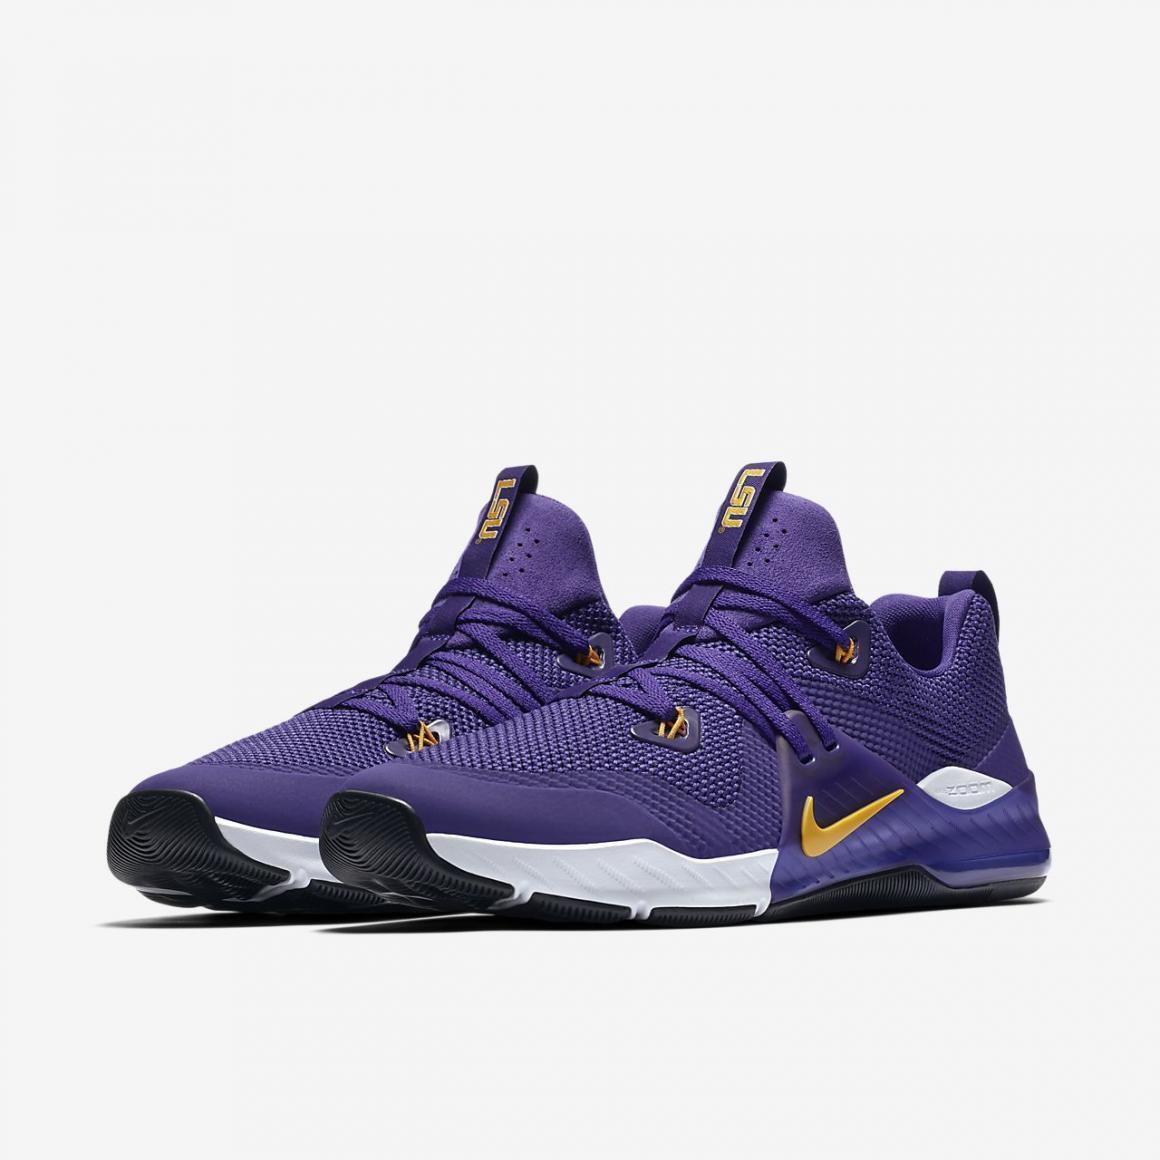 Nike Zoom Train Command College Men shoes LSU Multi-Sz Purple Uni gold AO4397 571